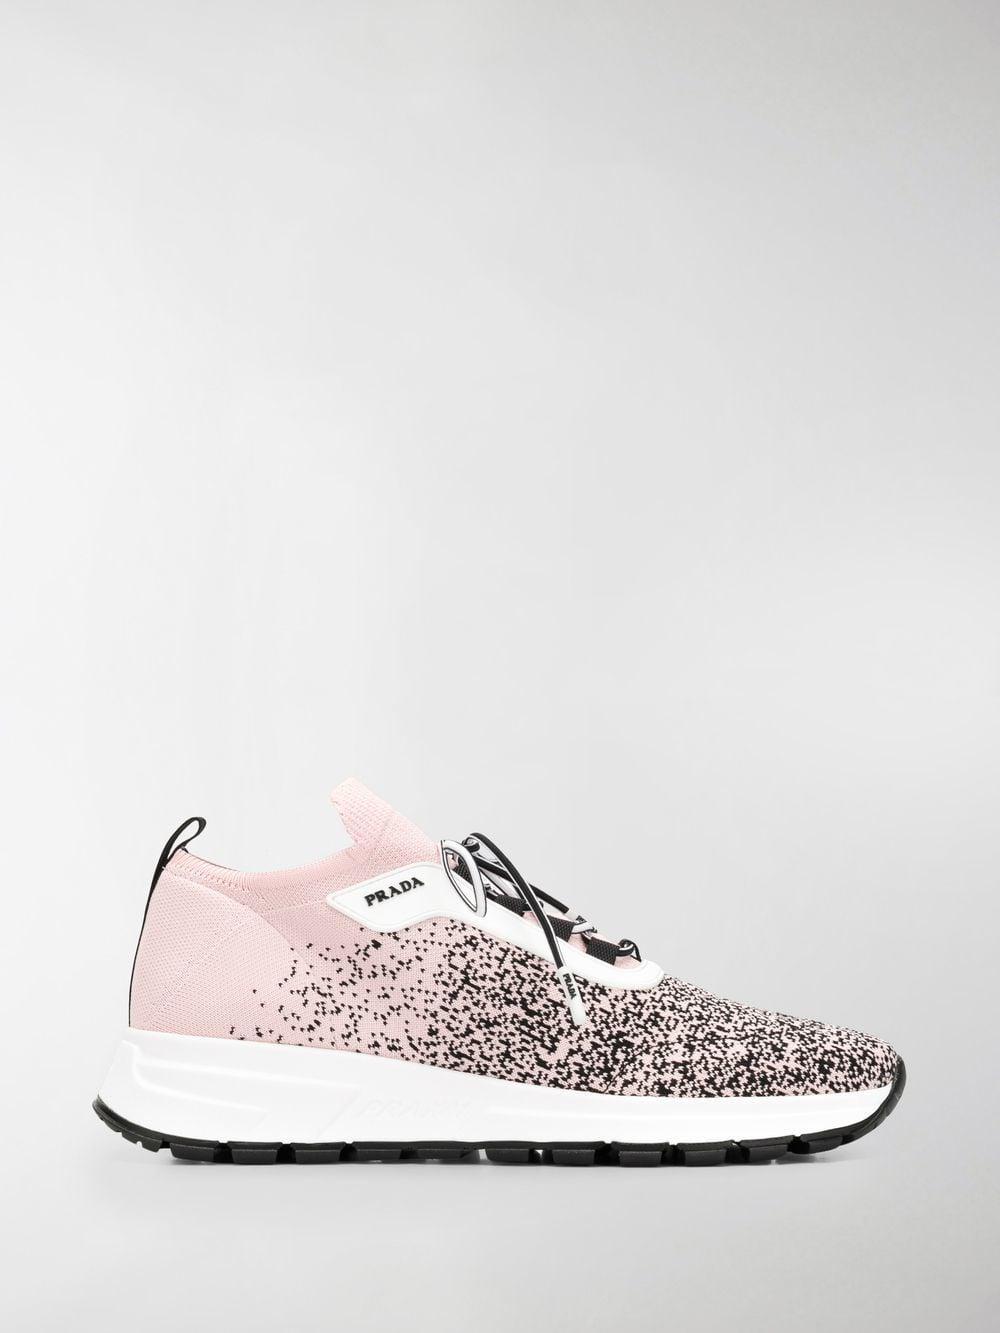 b0cbbe1a768 Prada - White Sock Lace-up Sneakers - Lyst. View fullscreen